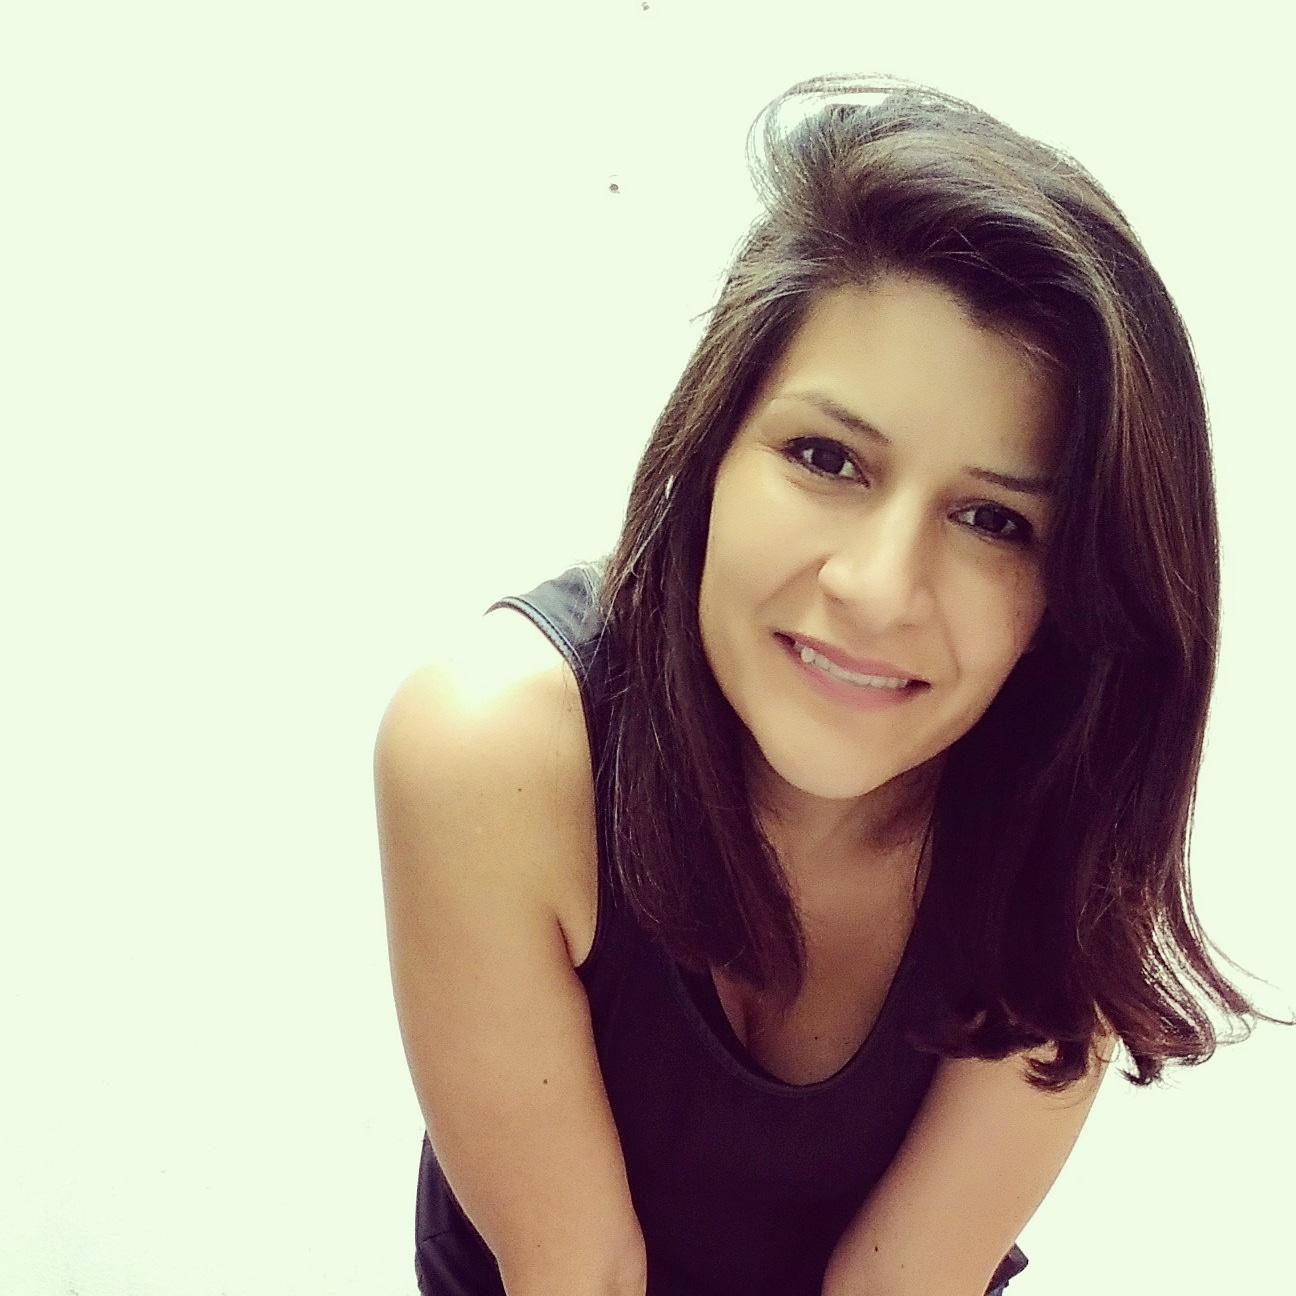 Marina Grigera